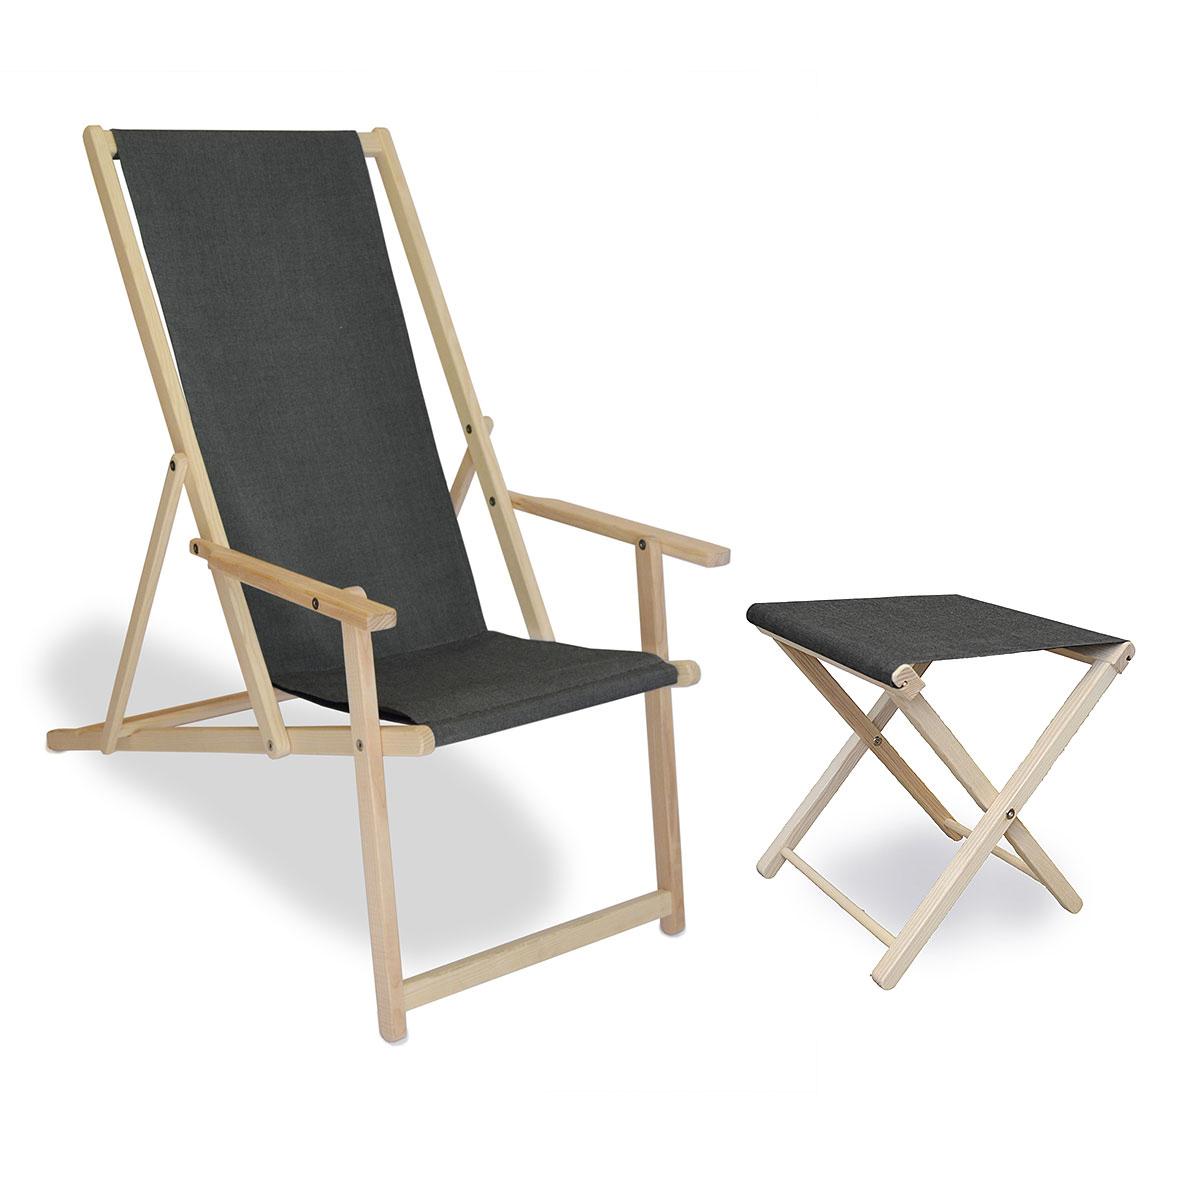 14475420180204 liegestuhl bedrucken schweiz inspiration. Black Bedroom Furniture Sets. Home Design Ideas